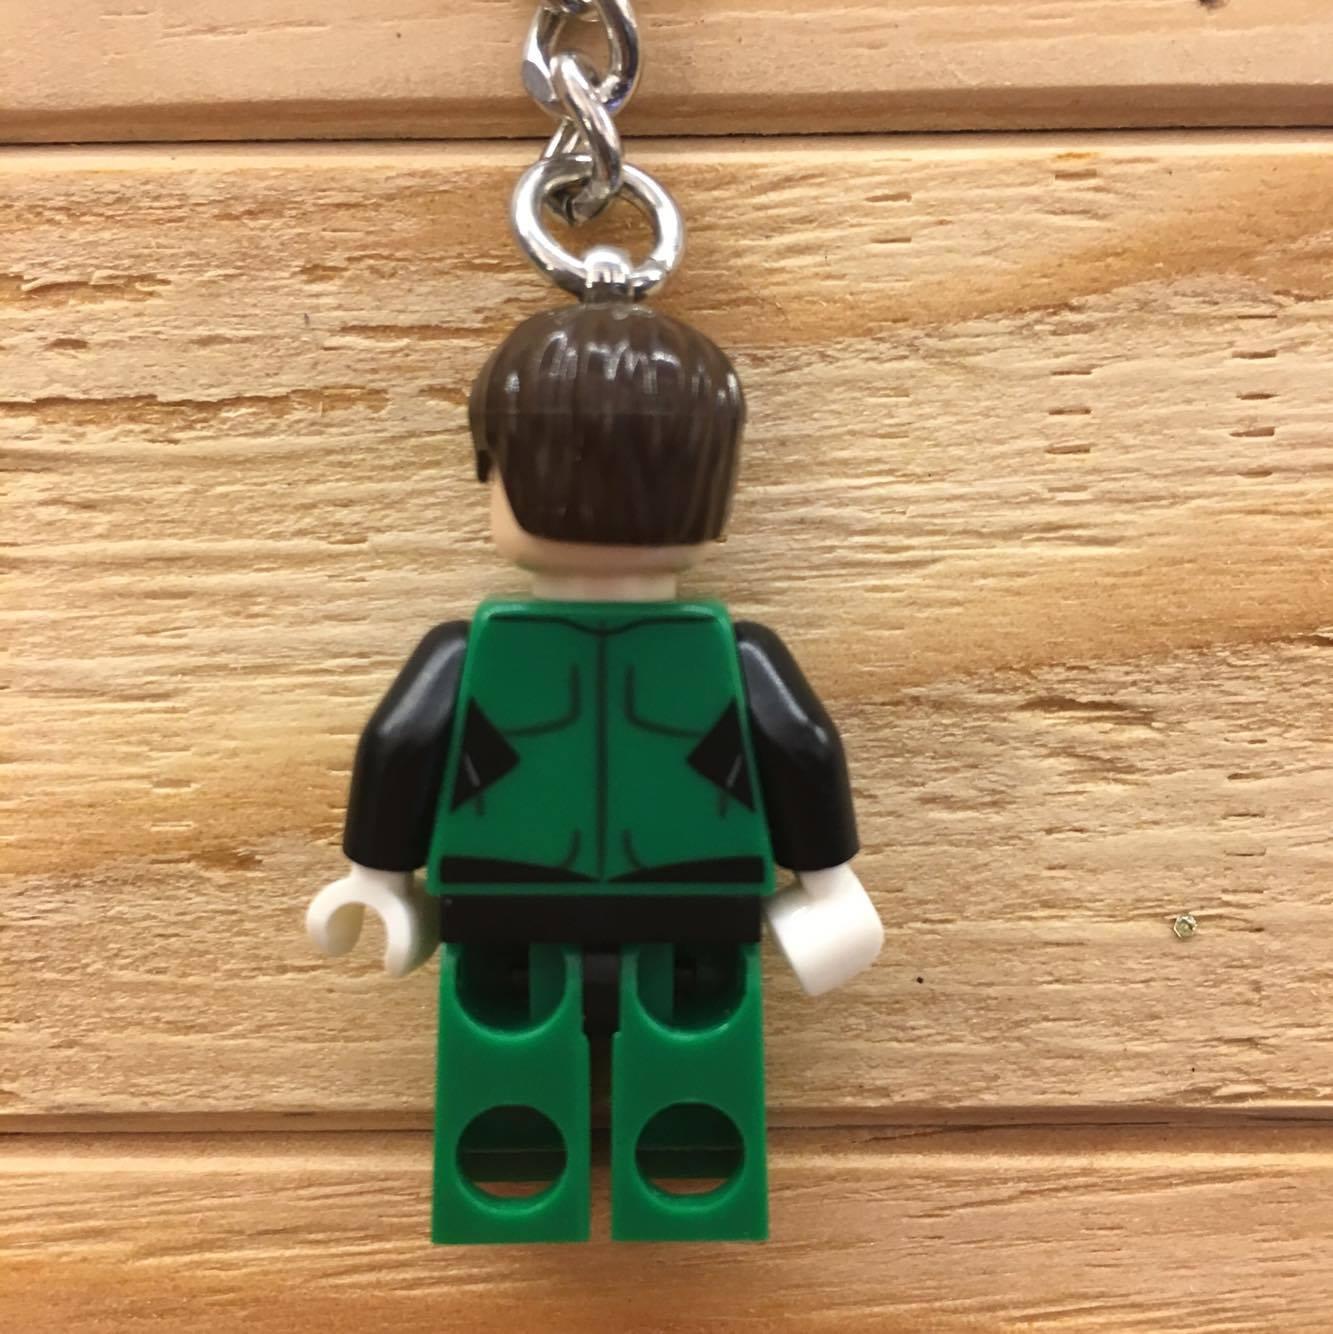 BEETLE LEGO SUPER HEROES GREEN LANTERN 綠燈俠 樂高 積木 鑰匙圈 玩具 2